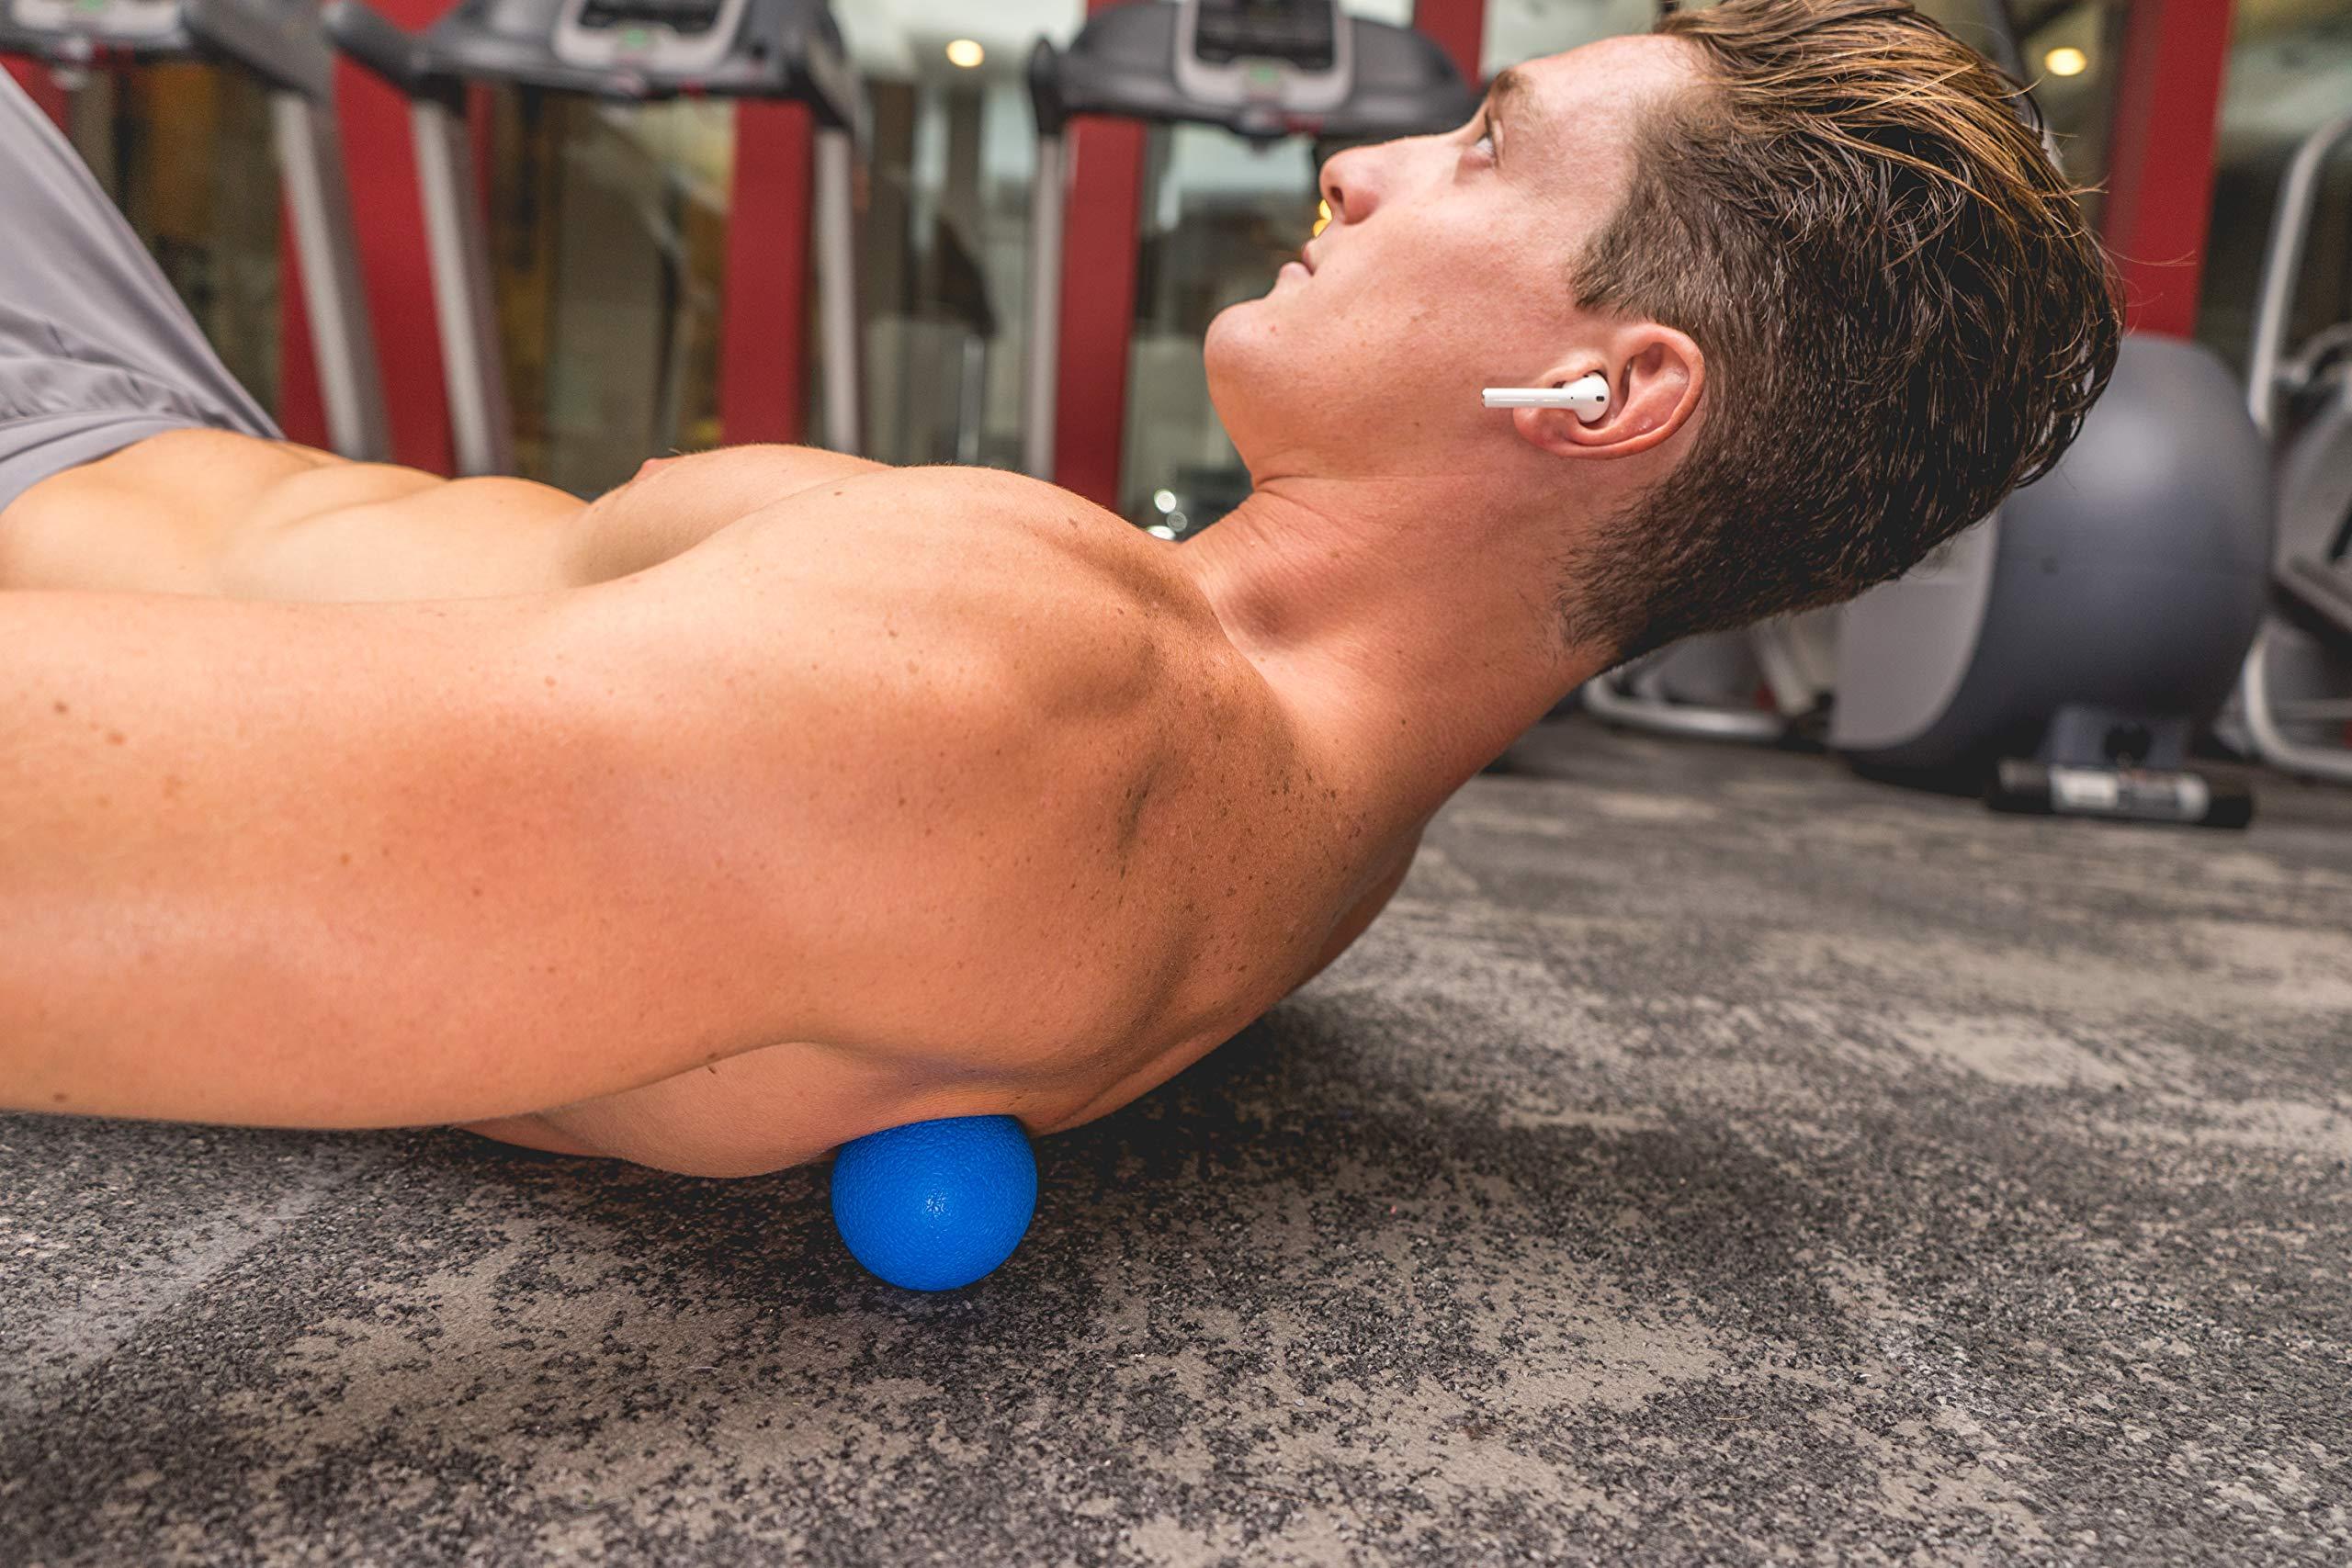 Muscle Massage Foam Roller Kit Back Massager Roller - 4 in 1 Best Trigger Point Massage Tool Lacrosse Roller Ball Massager Stick by Roller Buddy (Image #8)